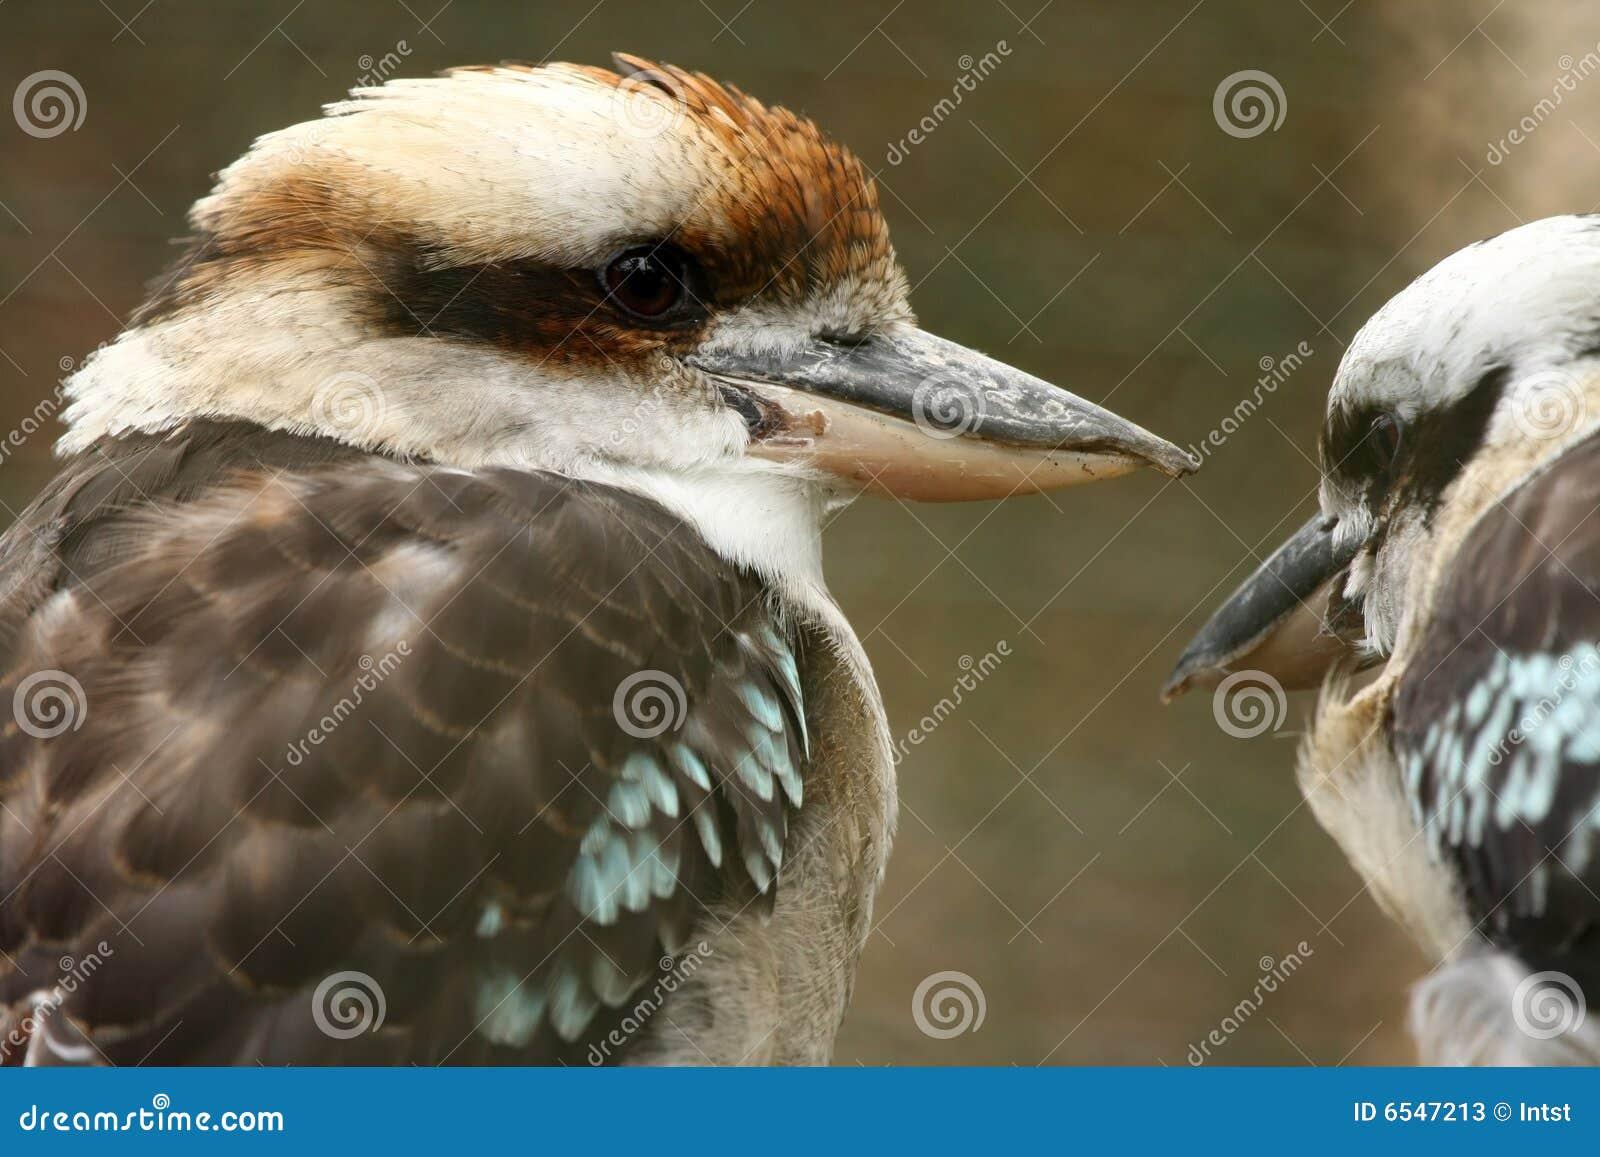 Australian Kookaburra pair